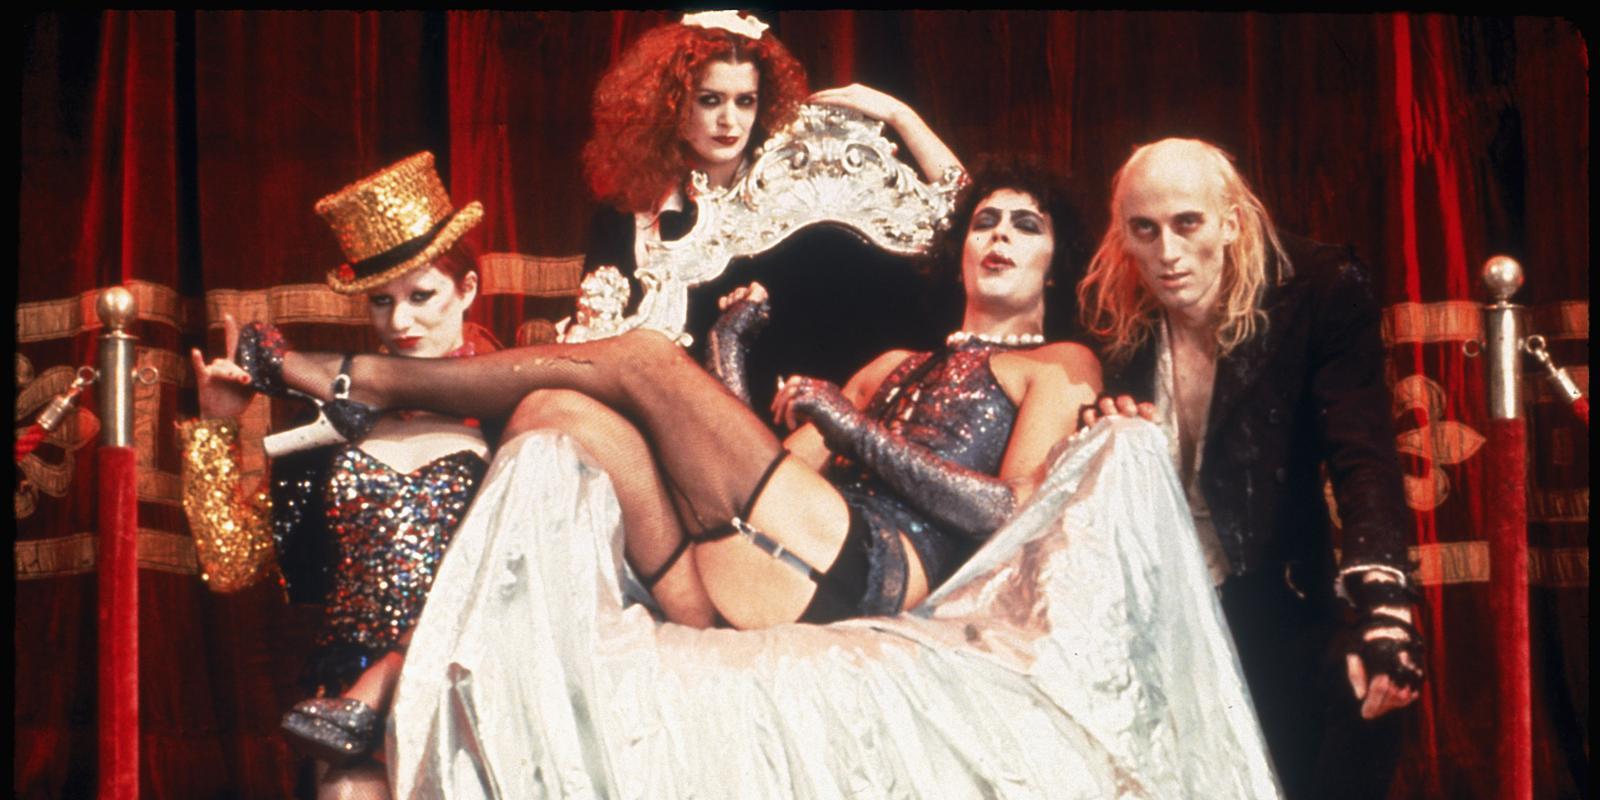 The Rocky Horror Picture Show, Jim Sharman, (c) Digital Spy